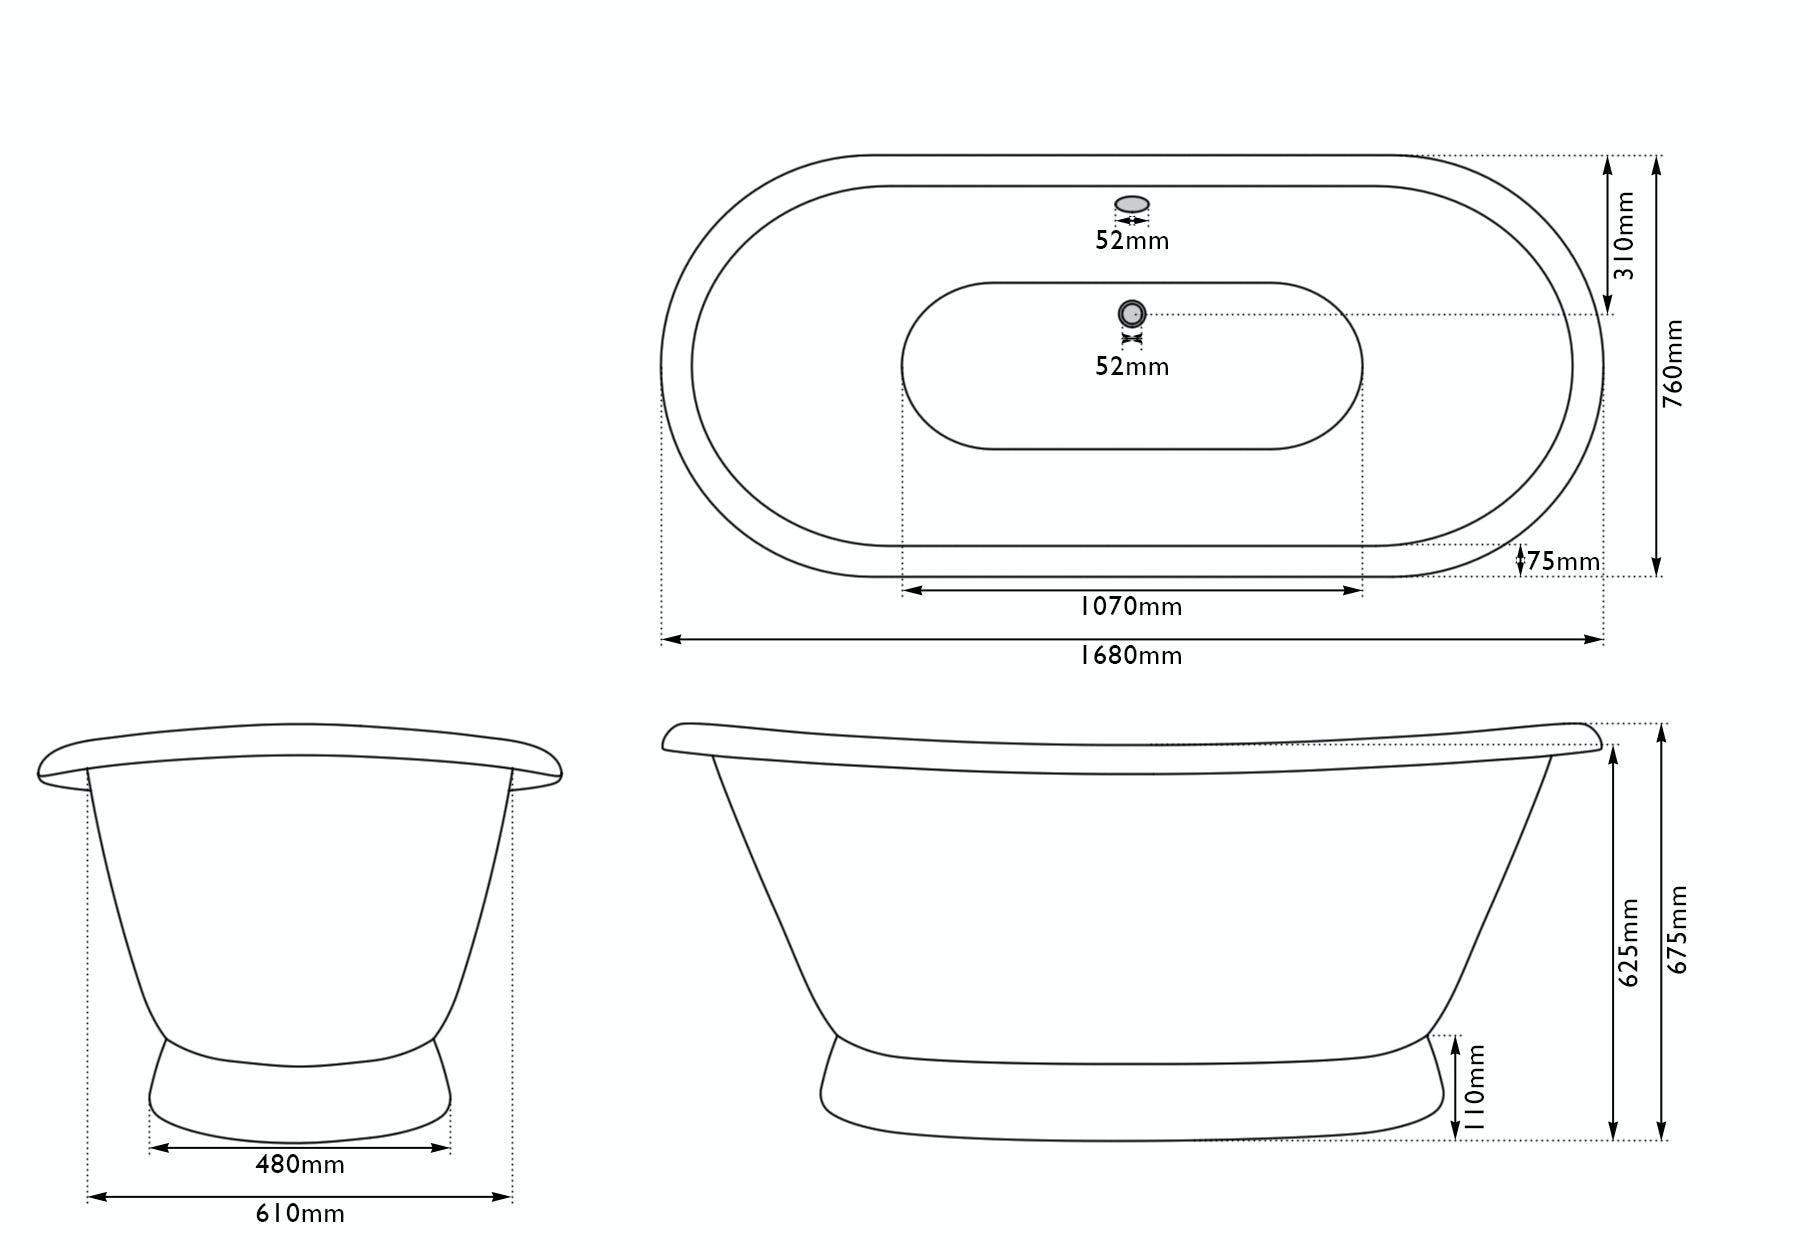 Dimensions for The Bath Co. Stirling pavilion grey cast iron bath